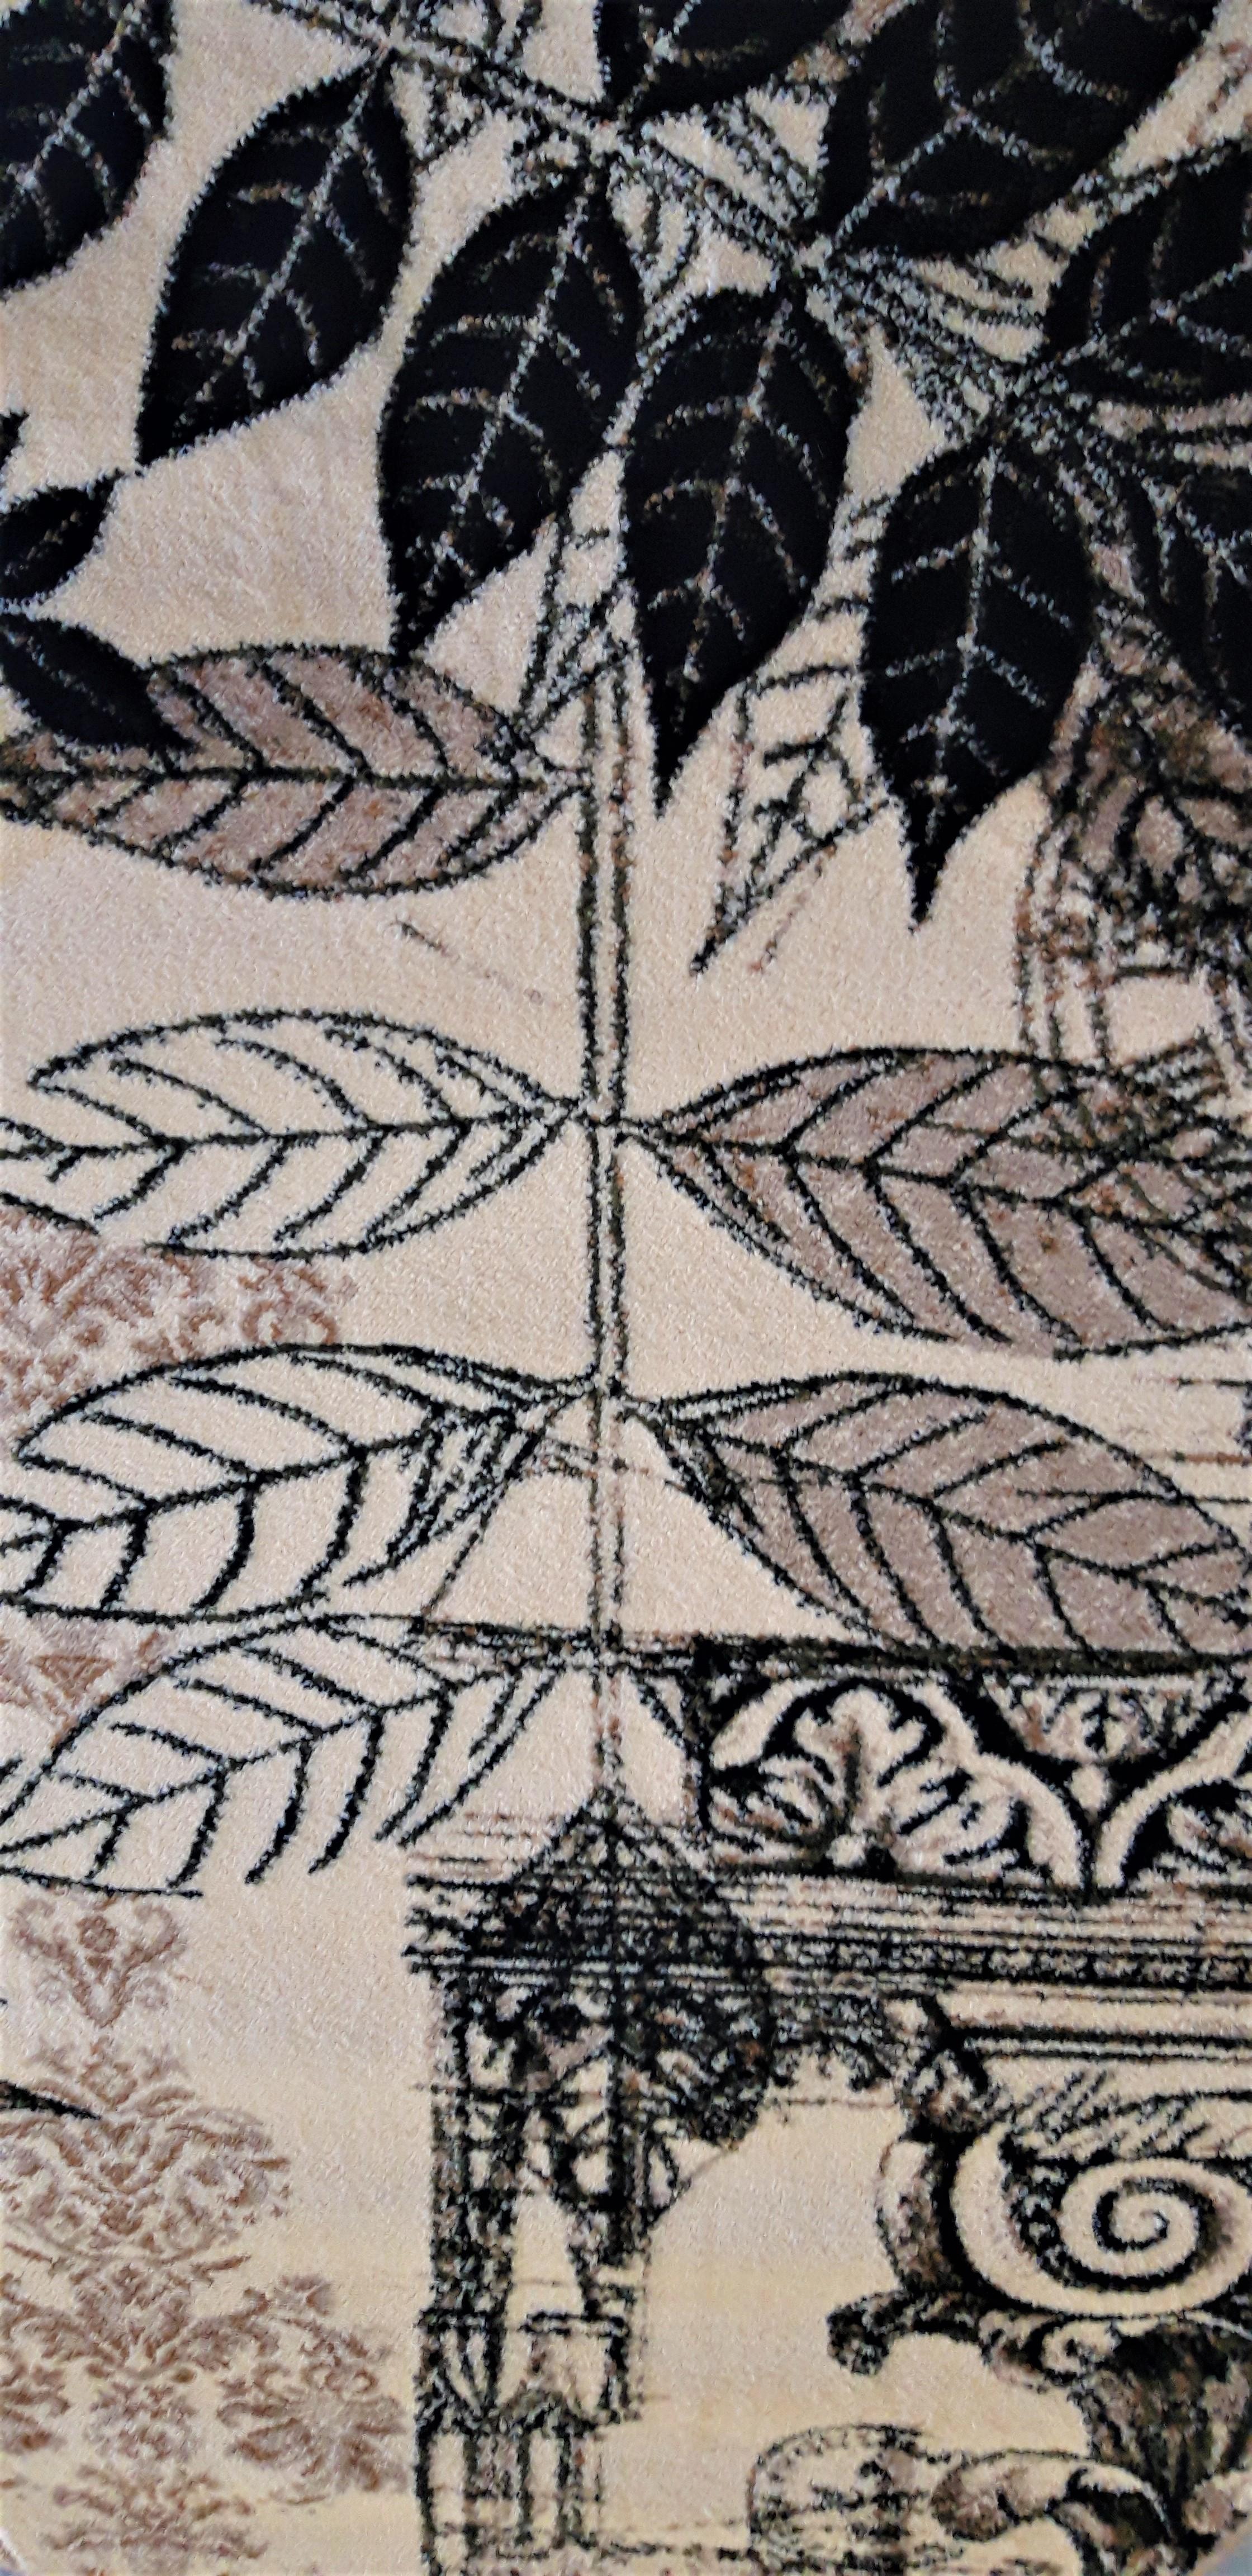 Covor Modern, Lotos Frunze 1545, Crem / Bej / Gri, Oval, 160x230 cm, 1800 gr/mp [7]